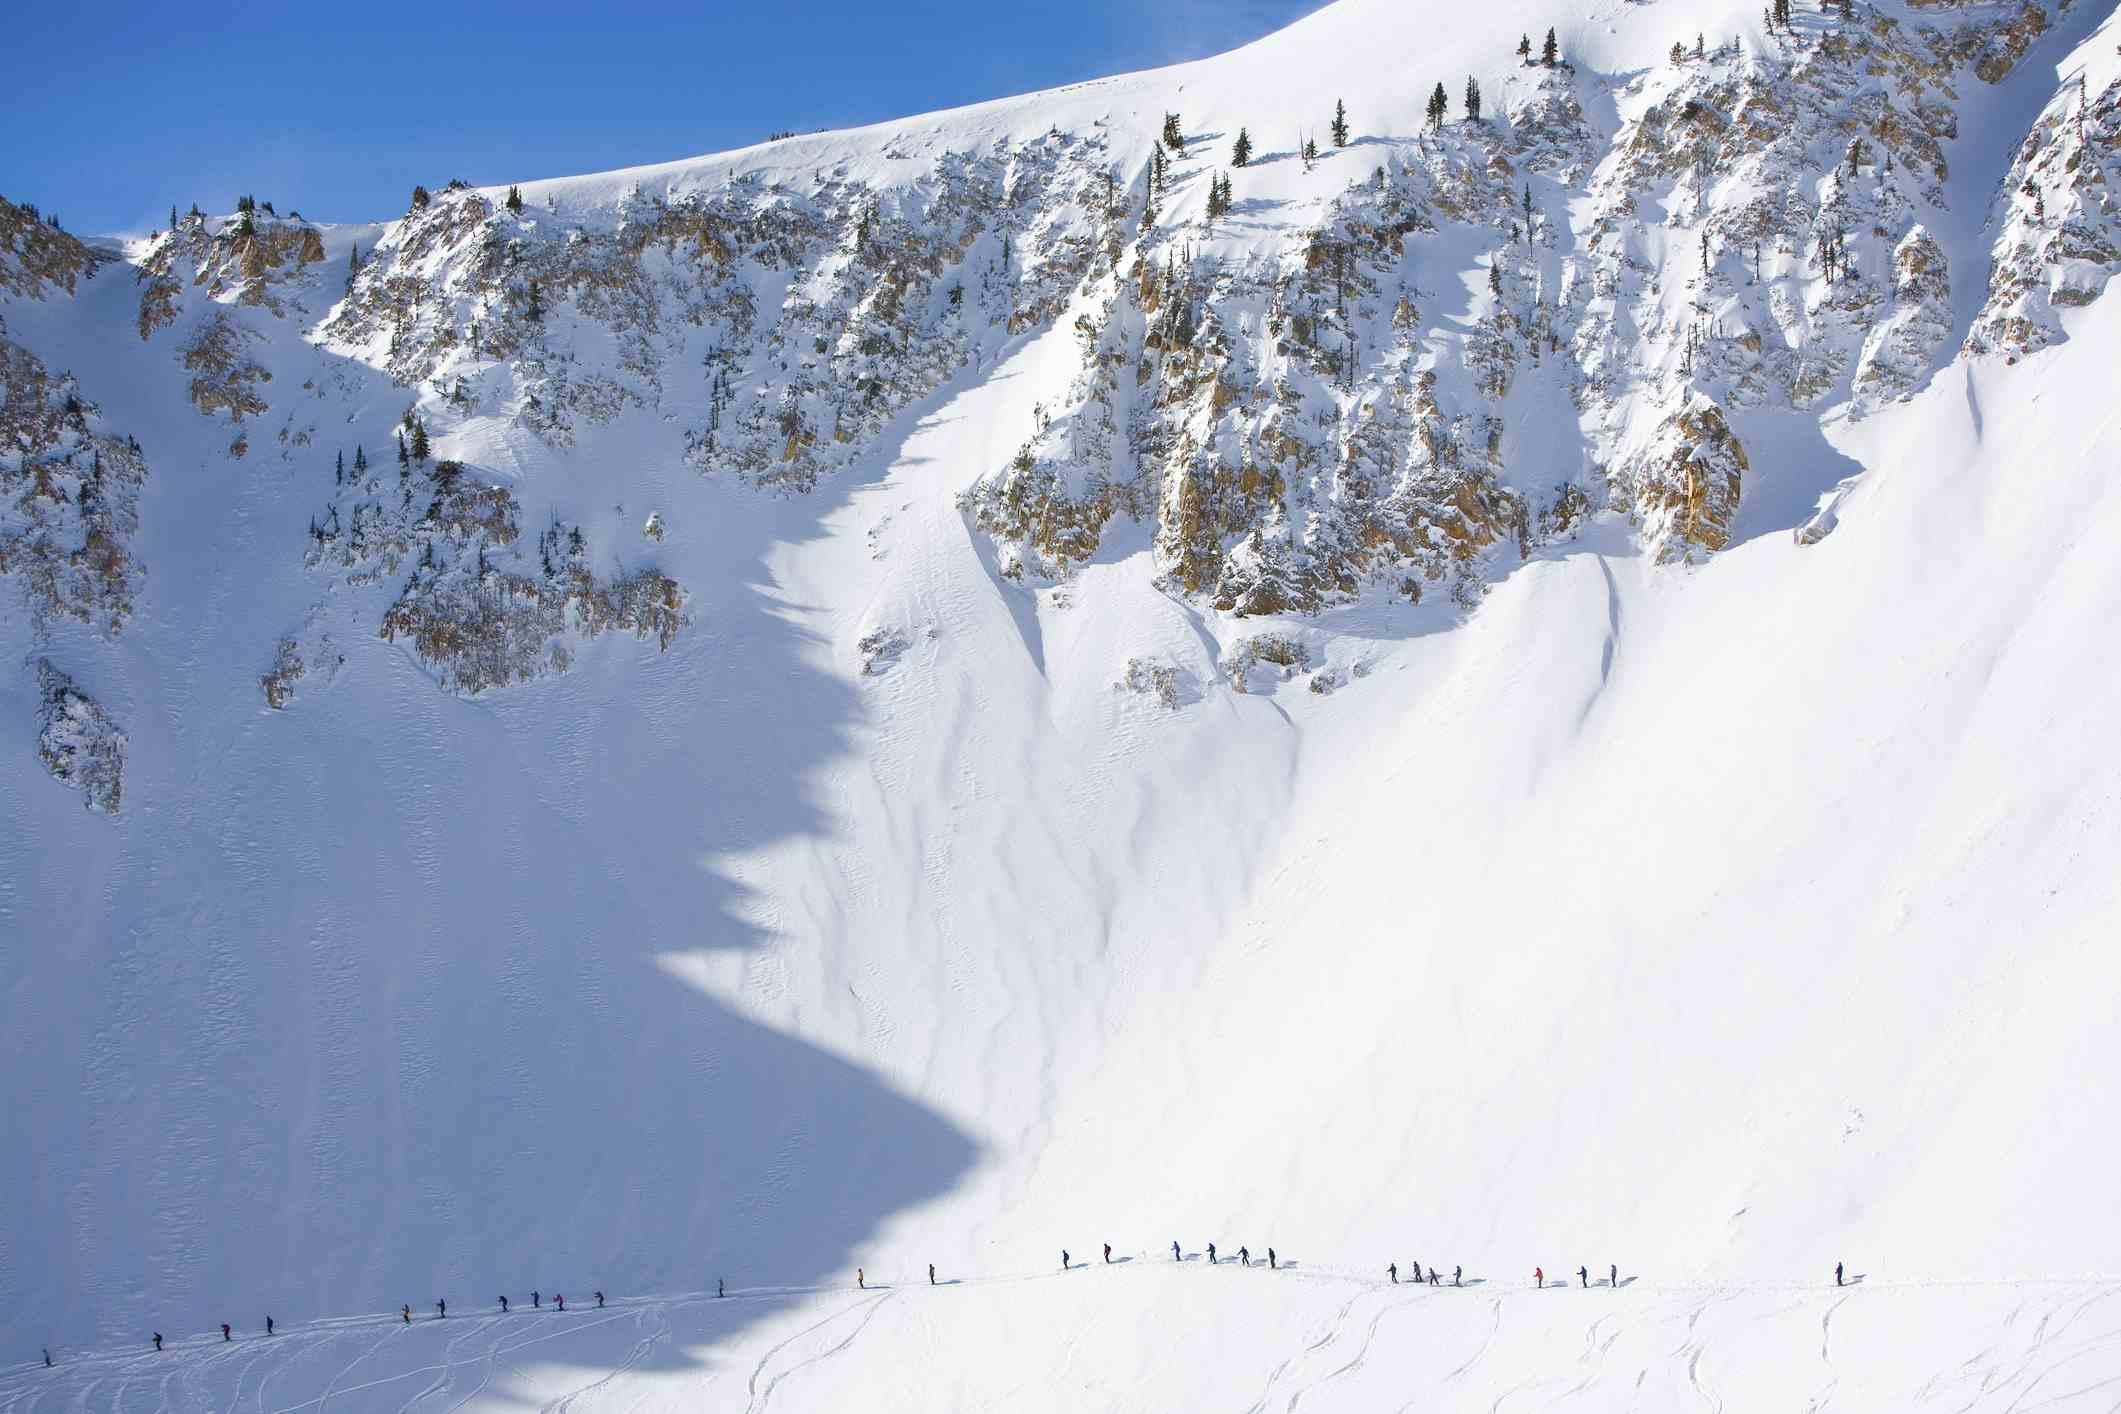 Skiers in Little Cottonwood Canyon, Utah.